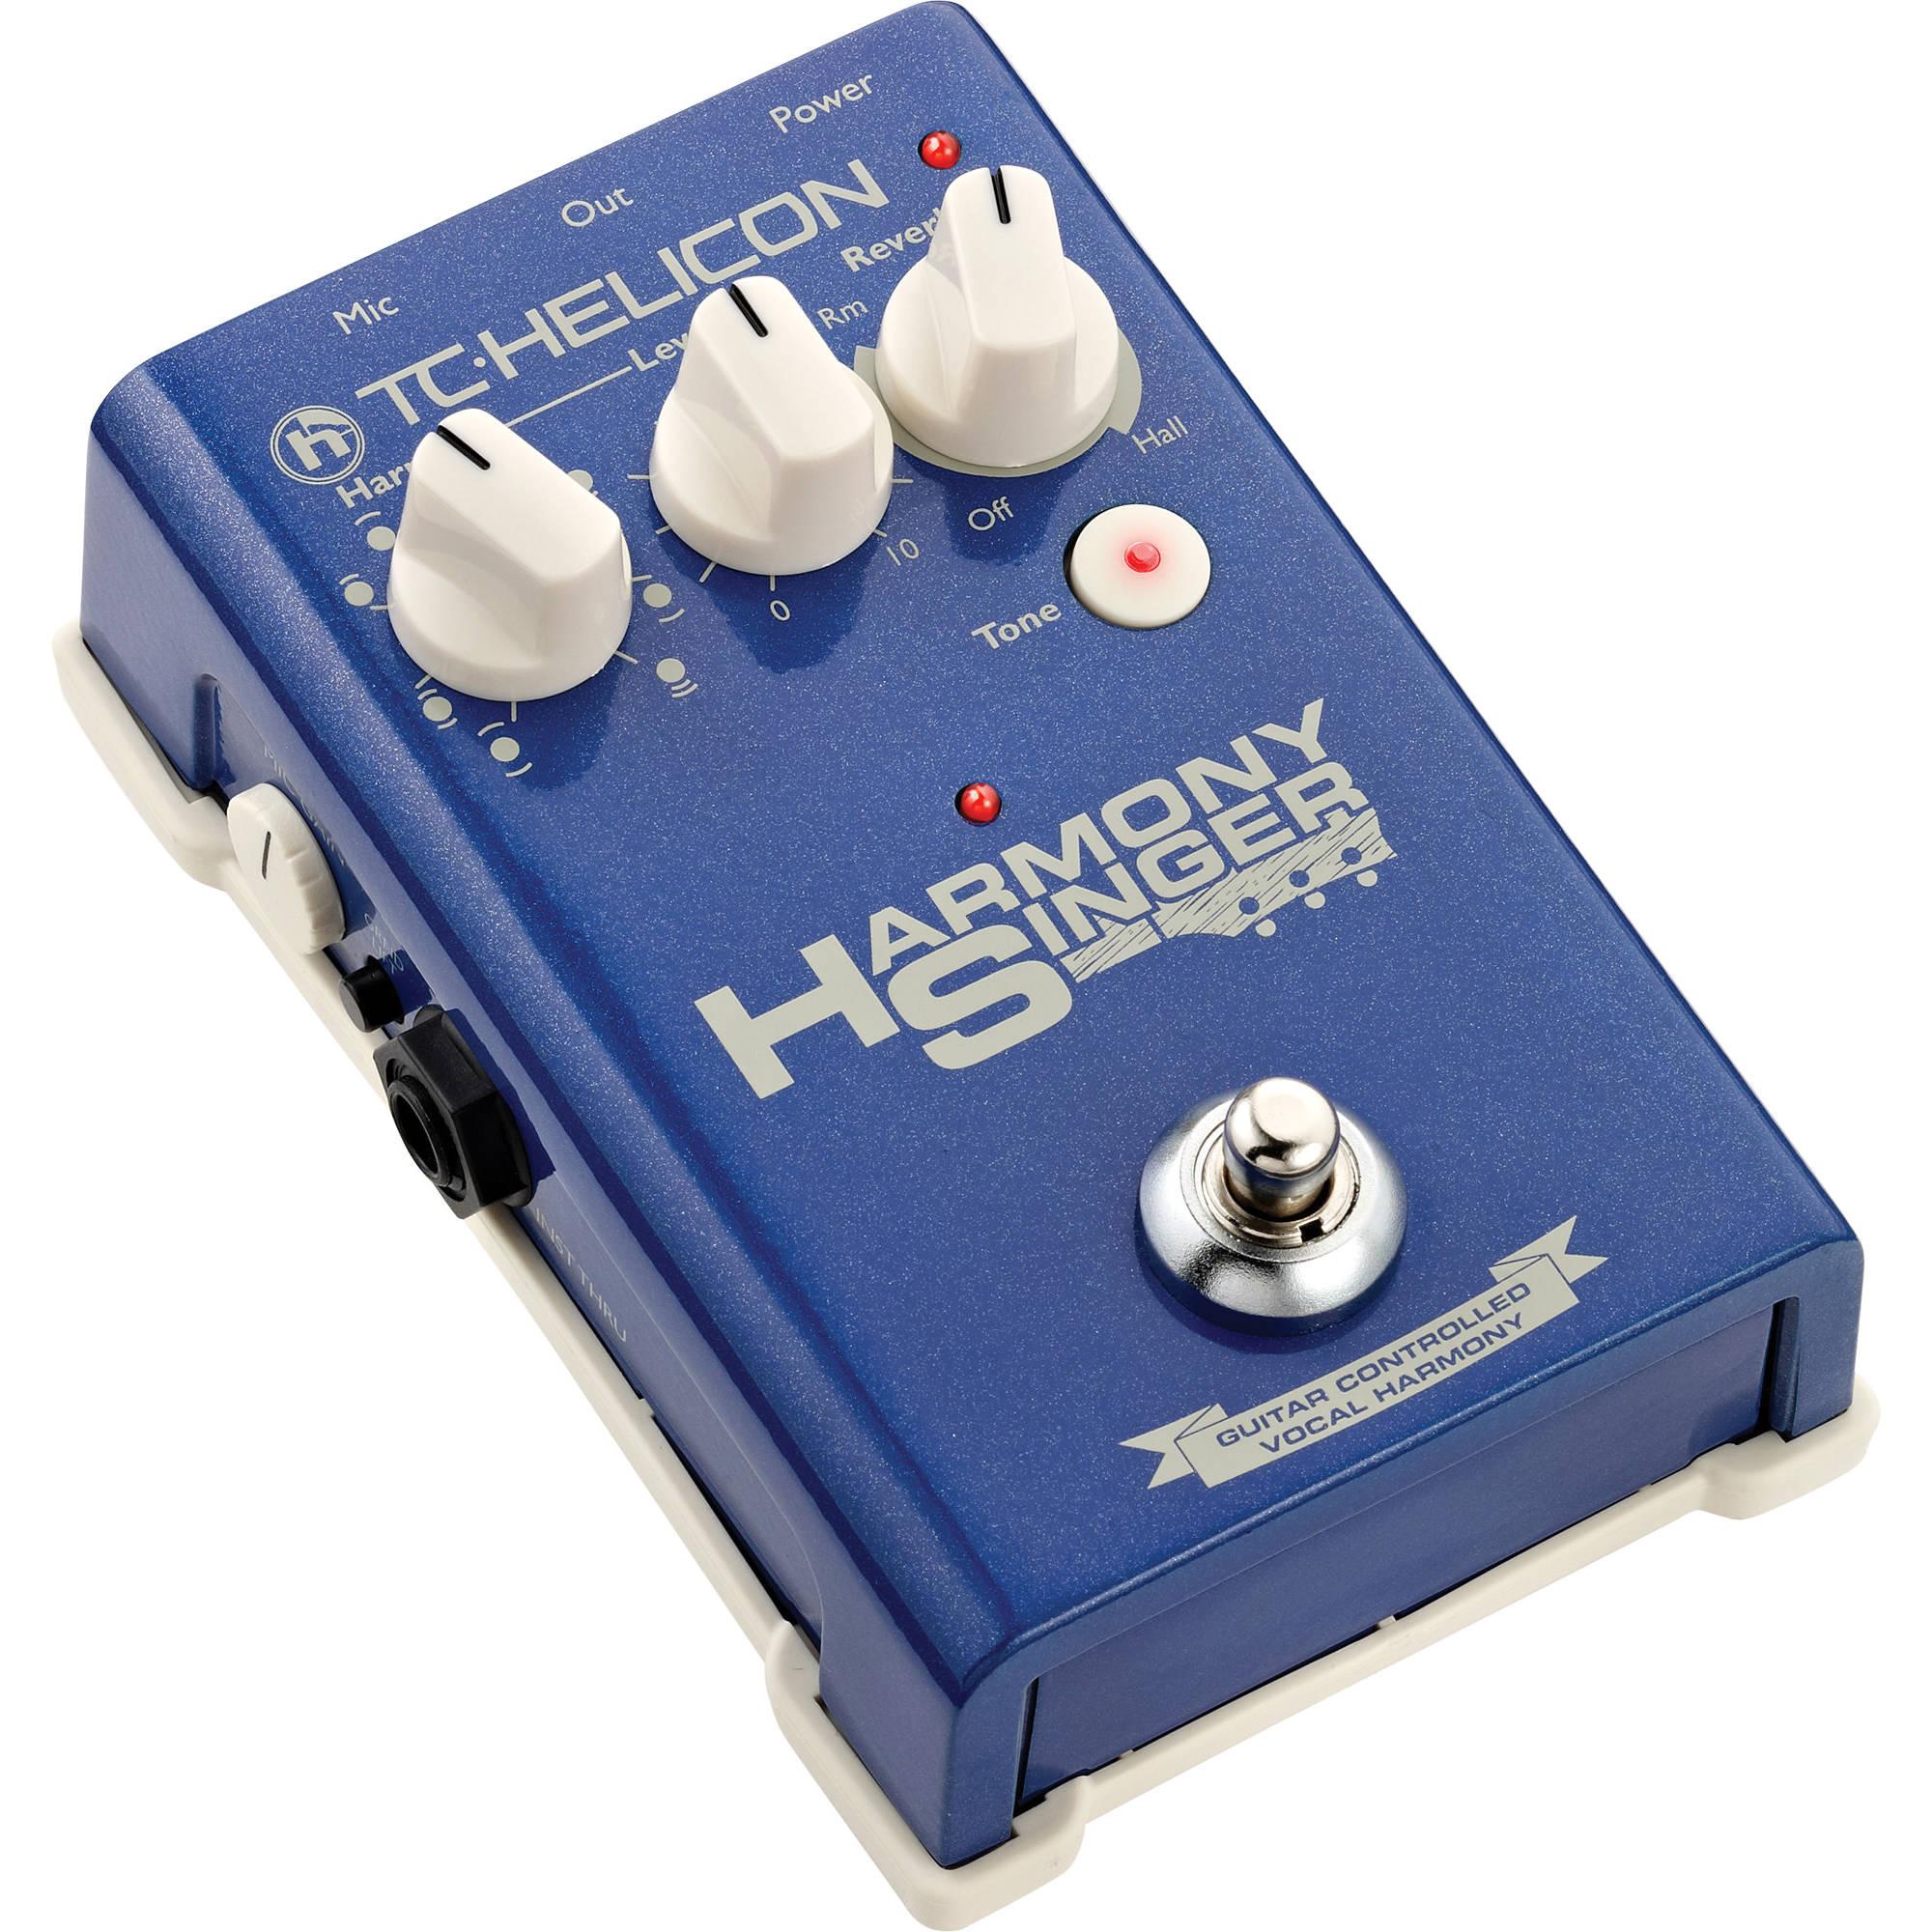 Pennsylvania Choral Harmony Tc Helicon Harmony Singer Vocal